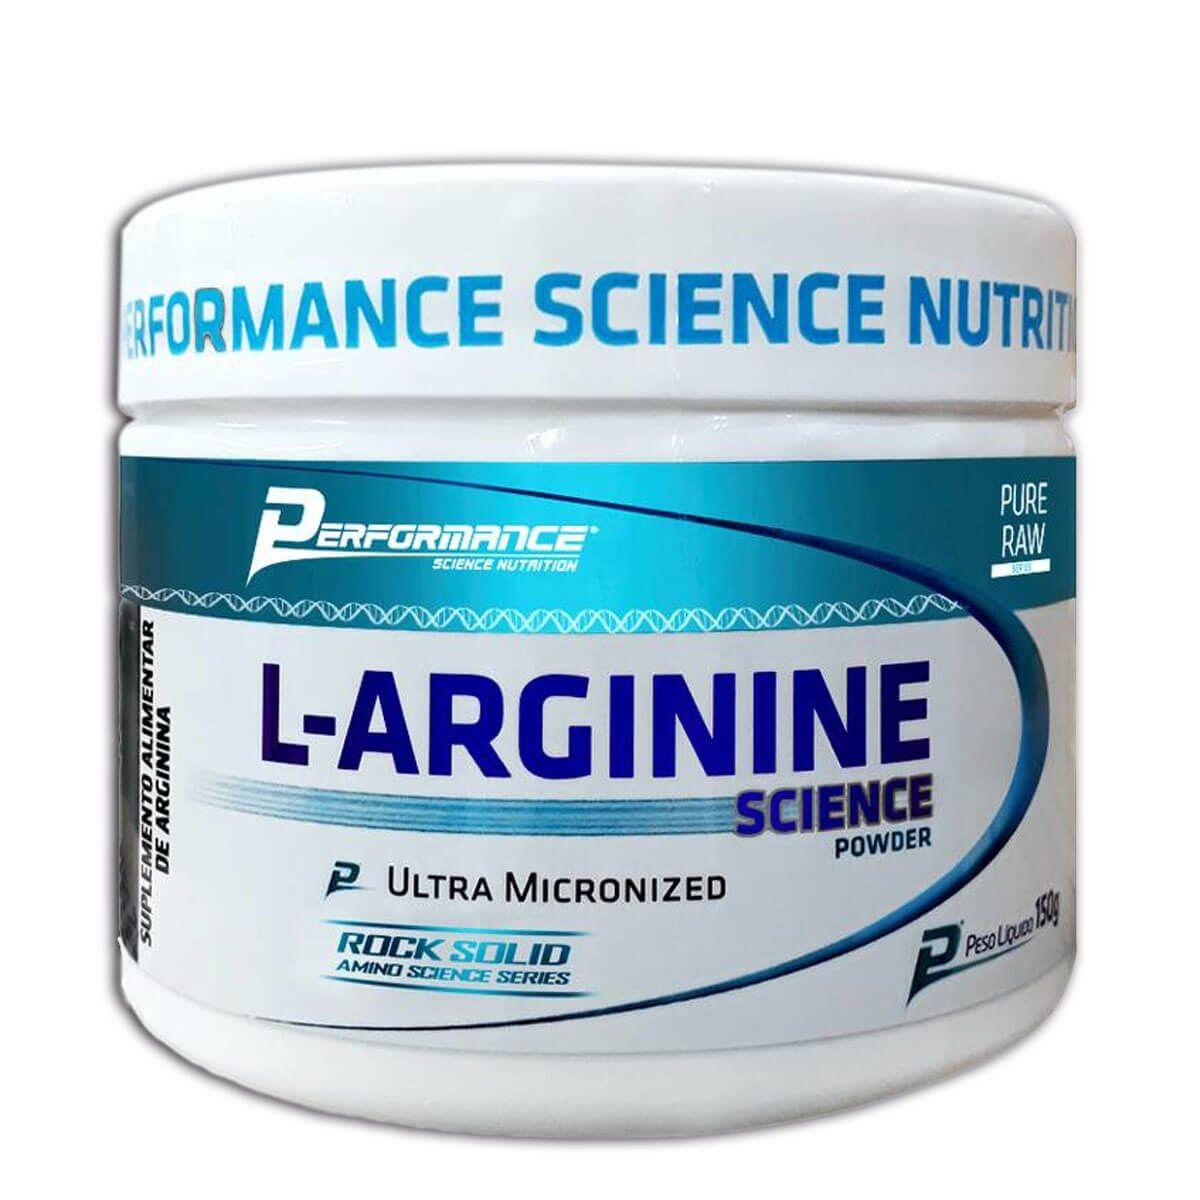 L-Arginine Science Powder 150g Performance